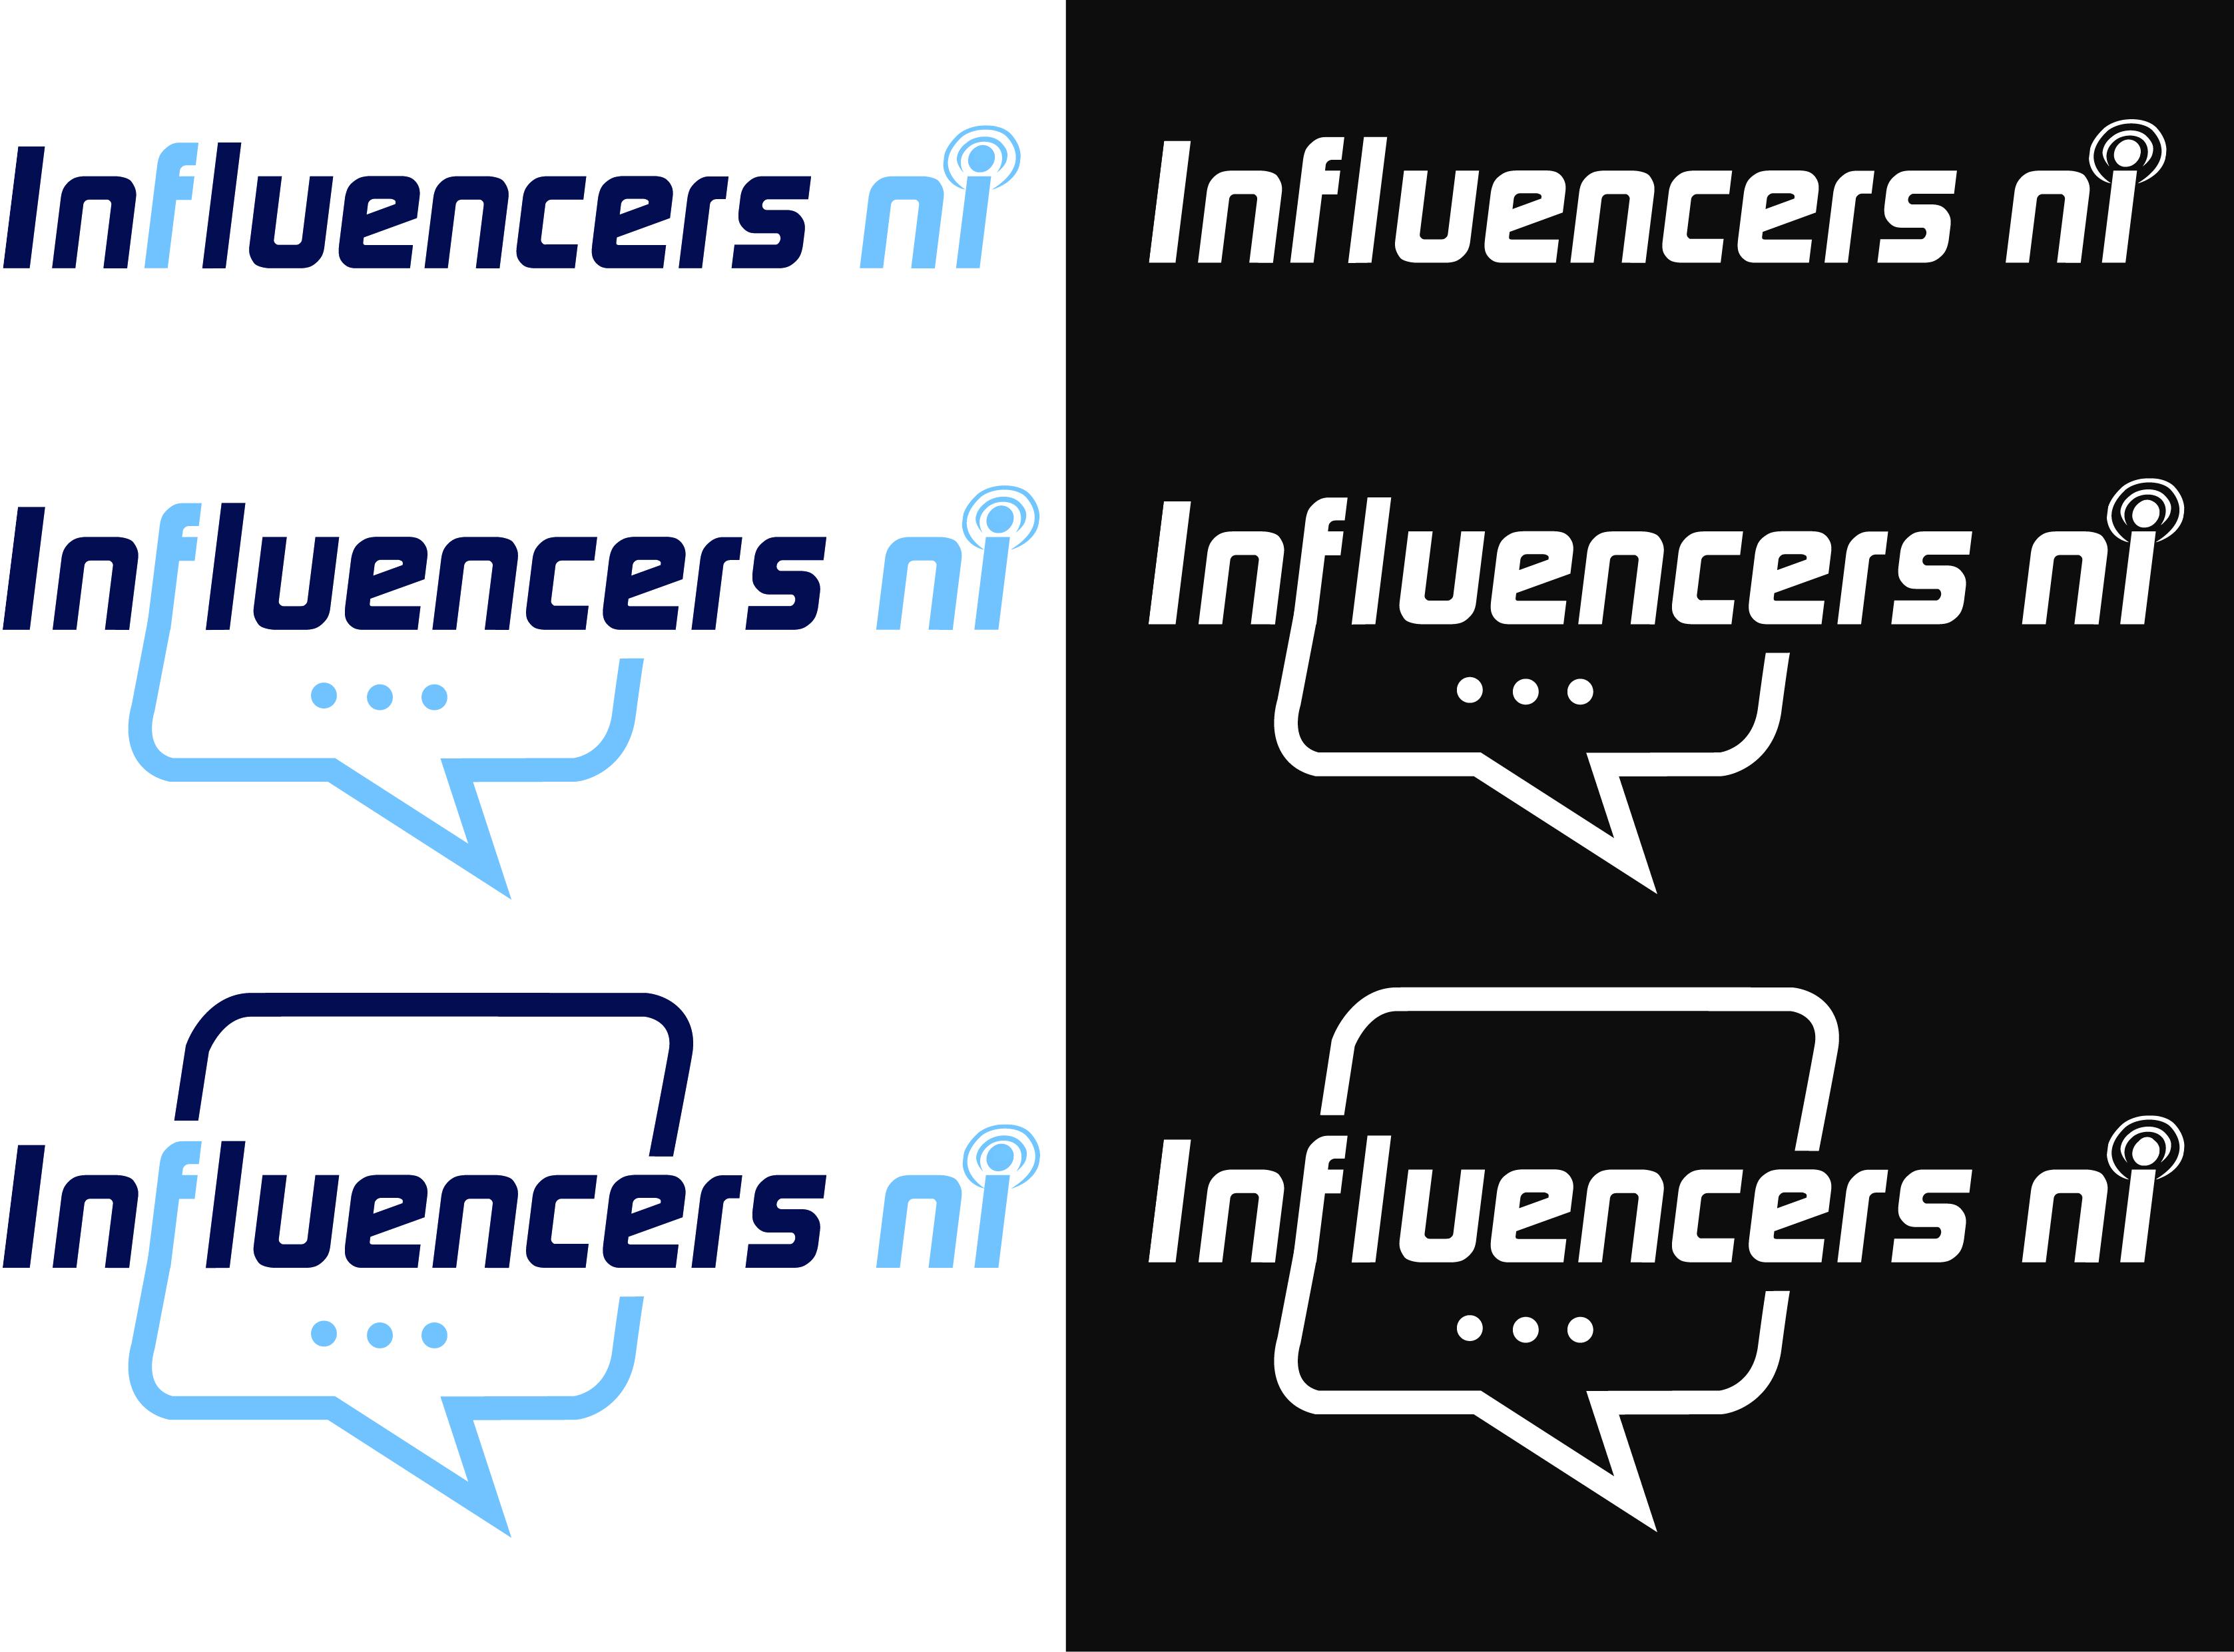 Influencers NI